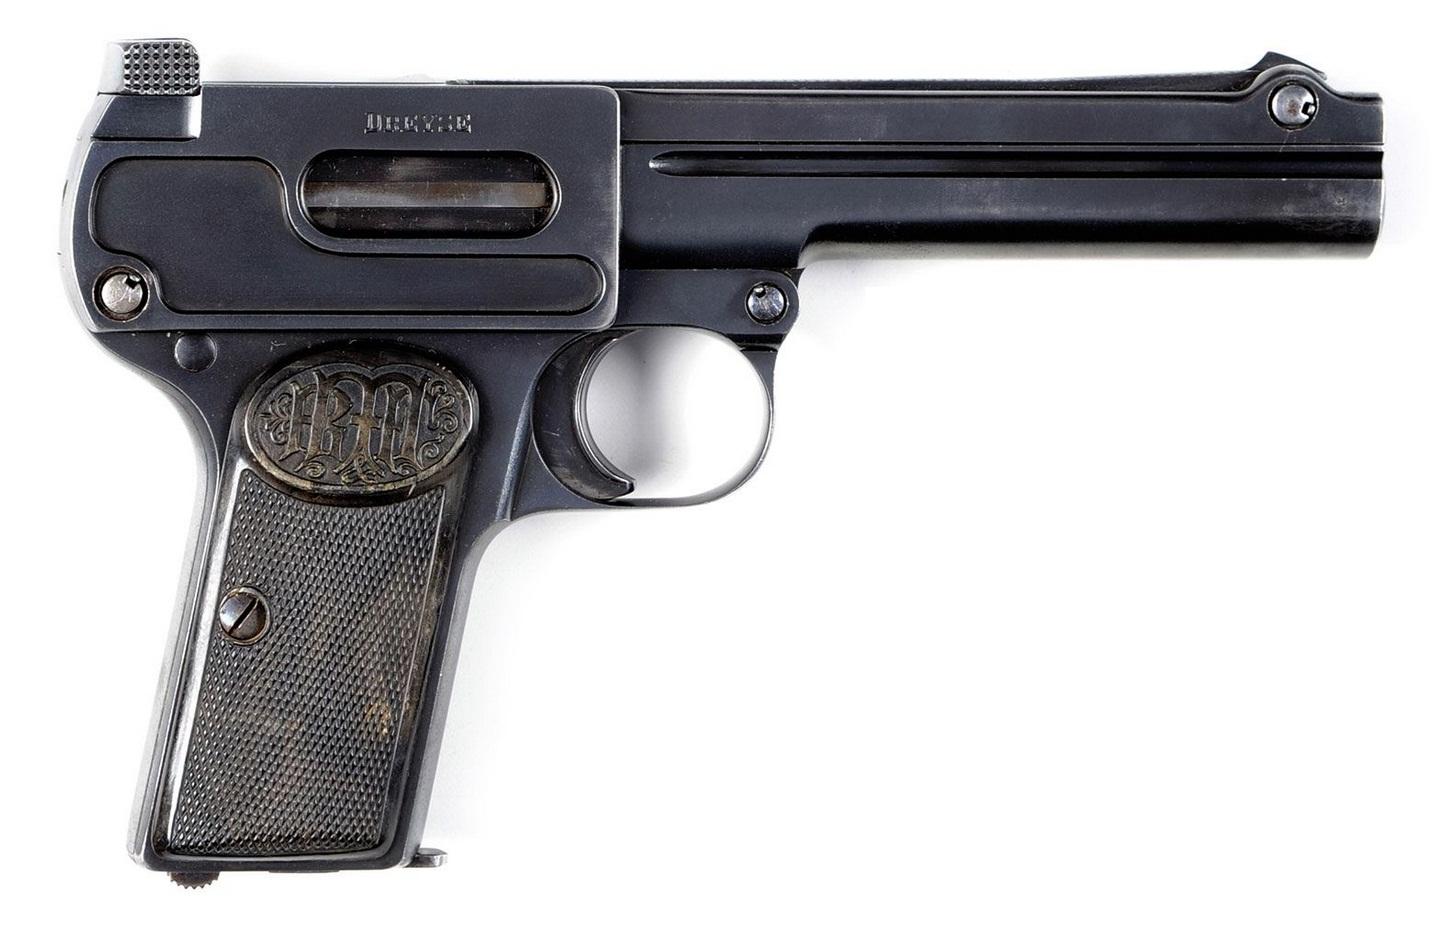 Пистолет Дрейзе калибра 9 мм